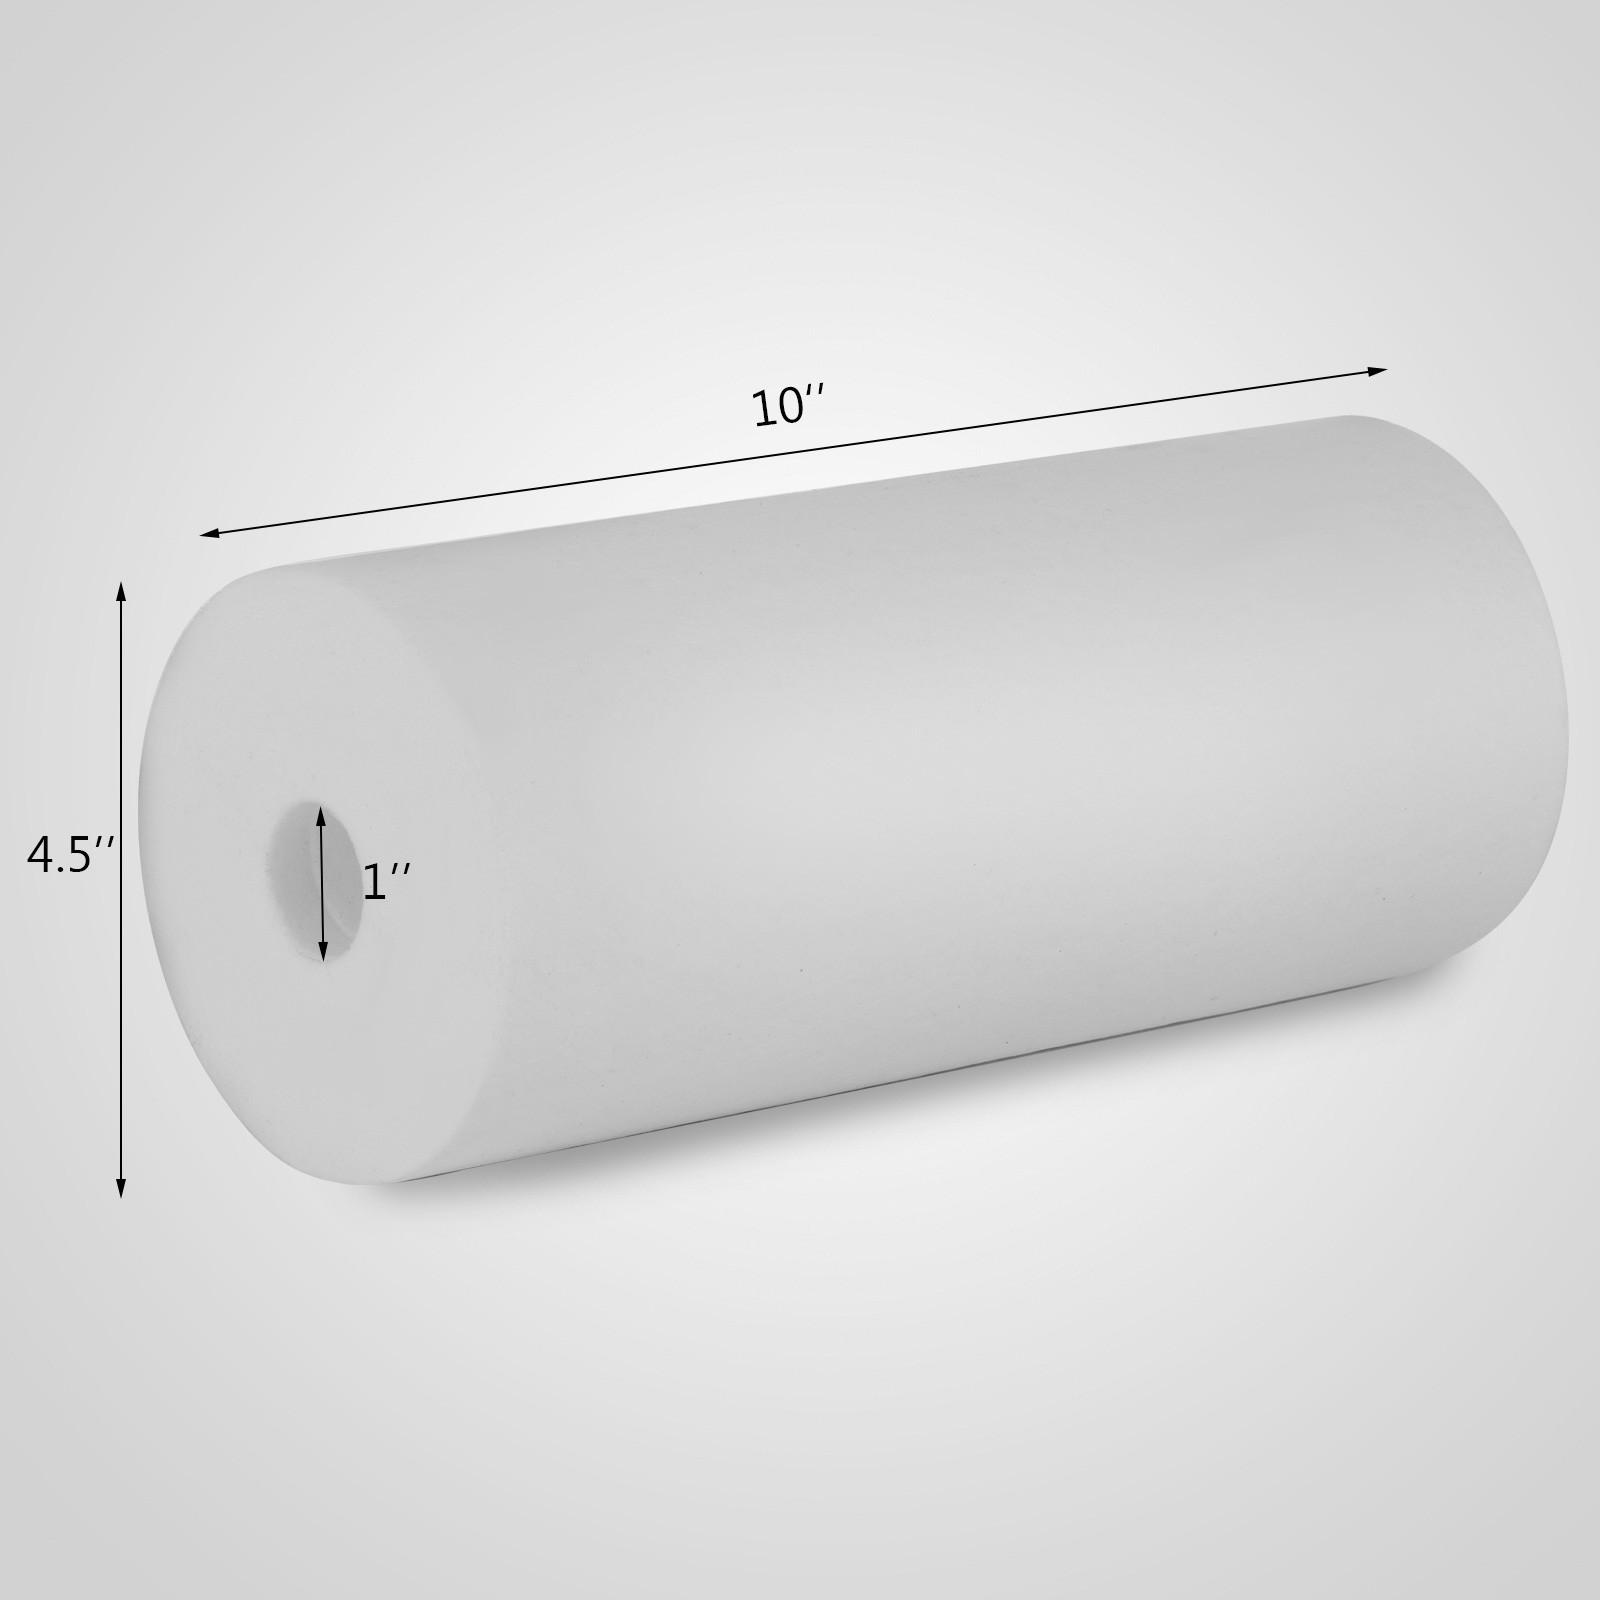 20Pcs-Cartouche-Filtrante-5-Micron-10-034-X-4-5-034-as-Brita-Emballe-Individu-Bobine miniature 2